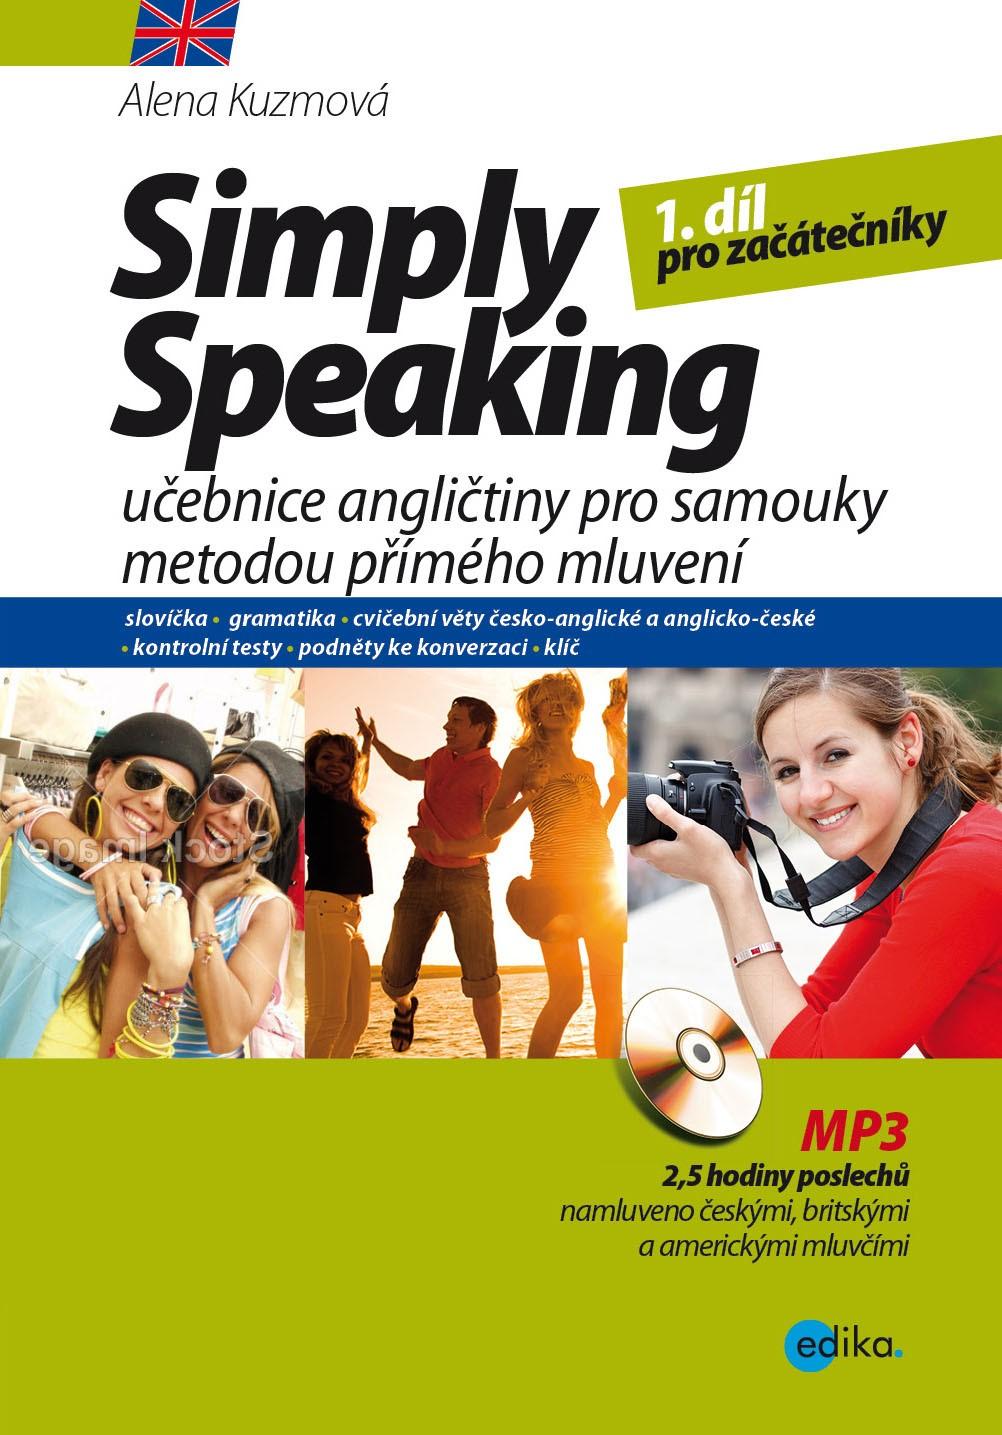 Simply Speaking | Alena Kuzmová